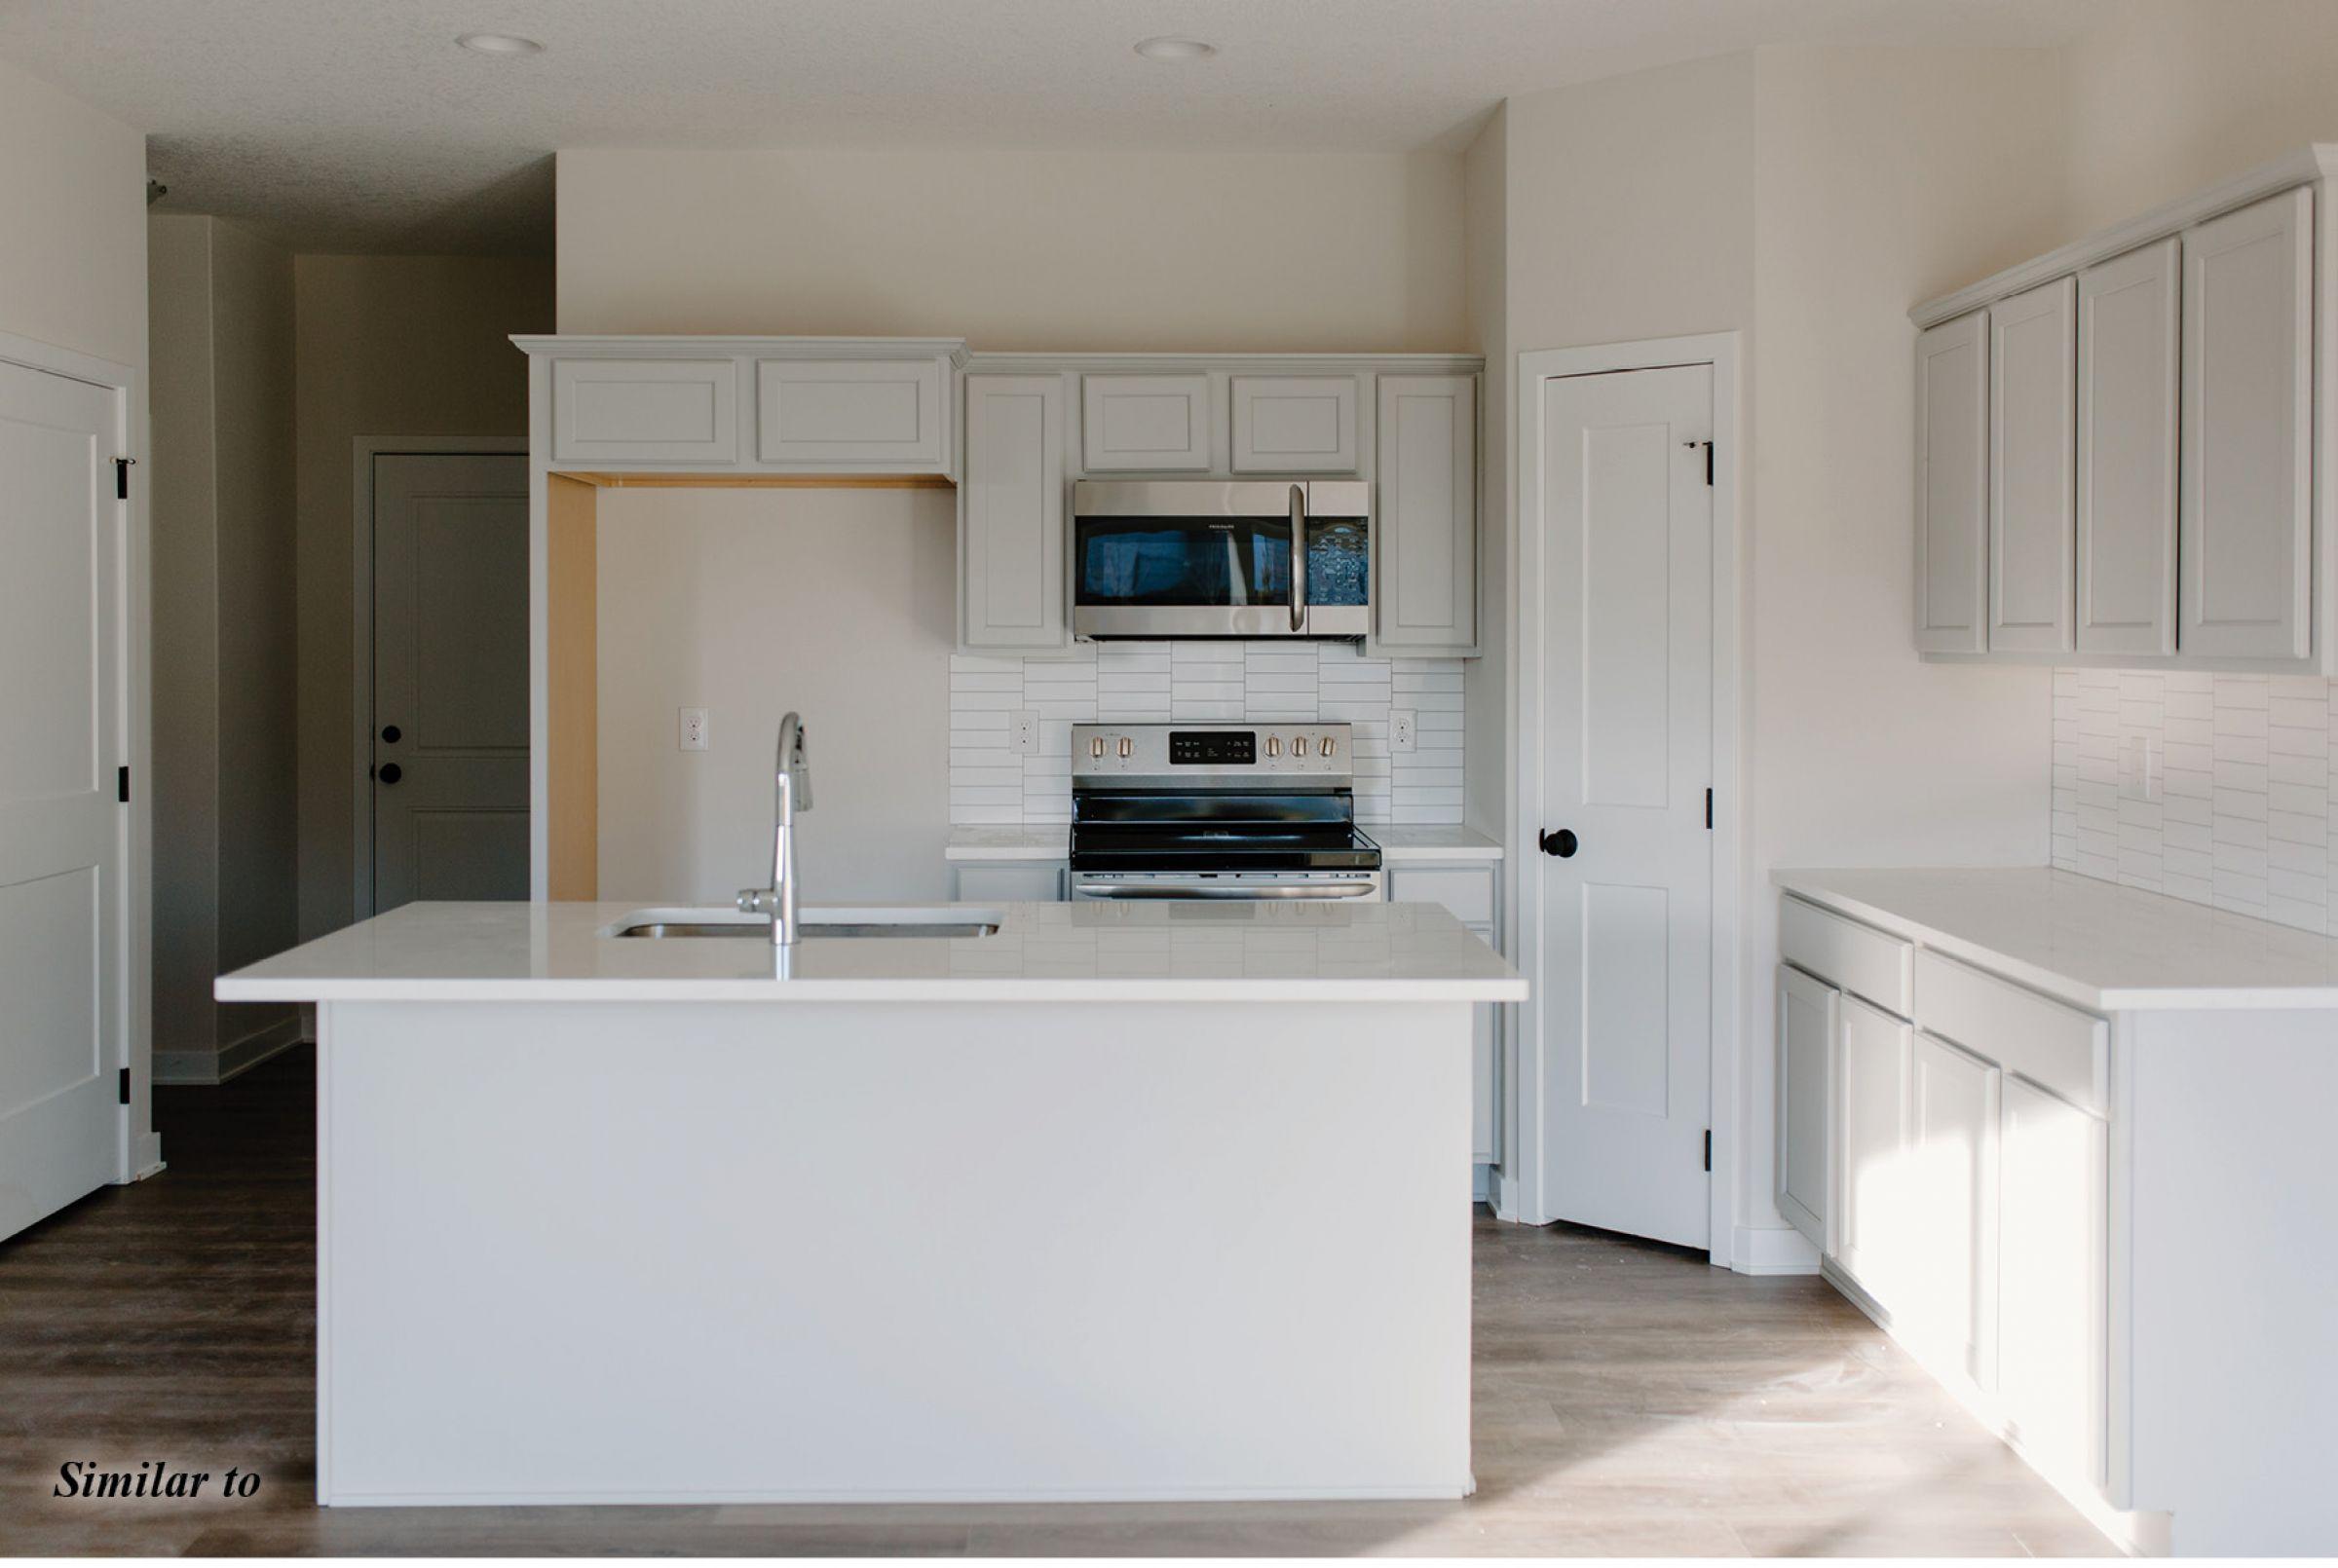 residential-warren-county-iowa-0-acres-listing-number-15675-2-2021-08-06-141914.jpg